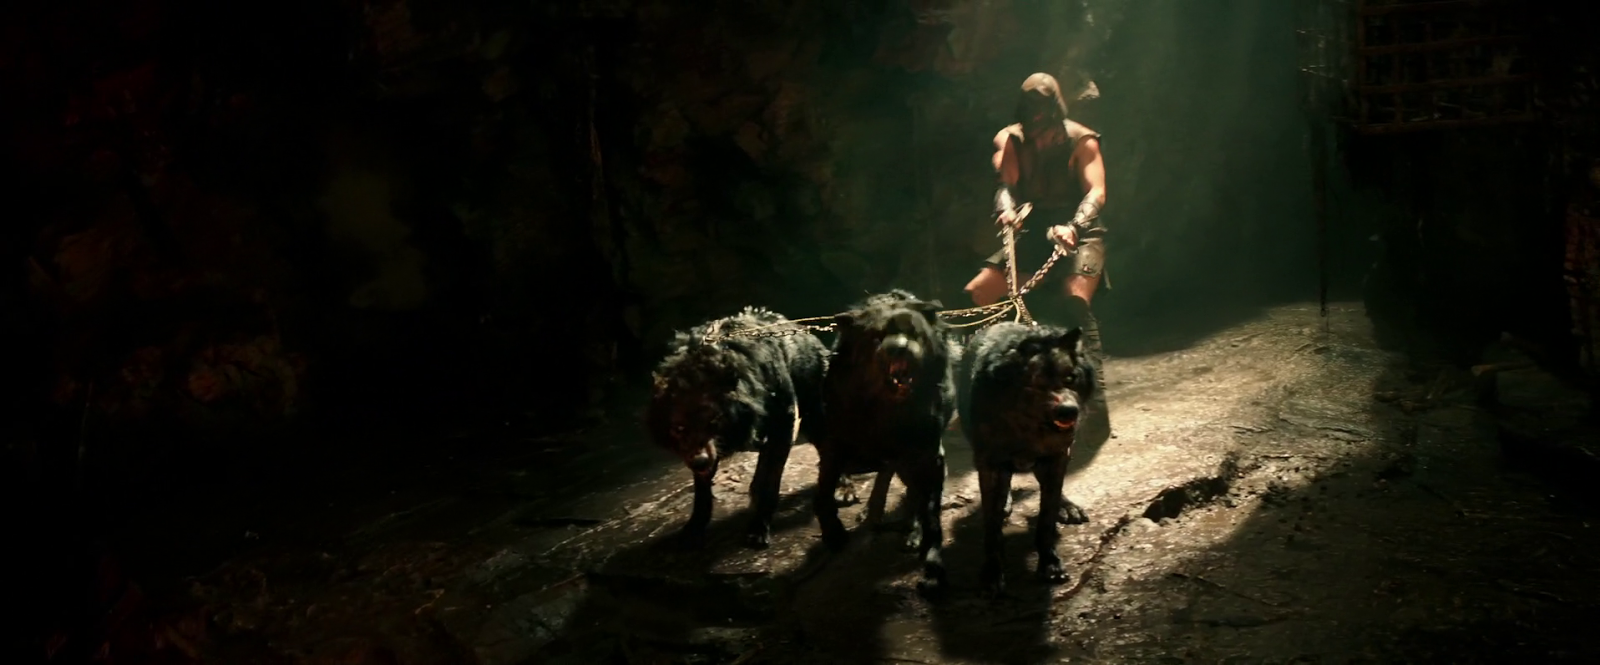 Cerberus Hercules Movie | www.pixshark.com - Images ...